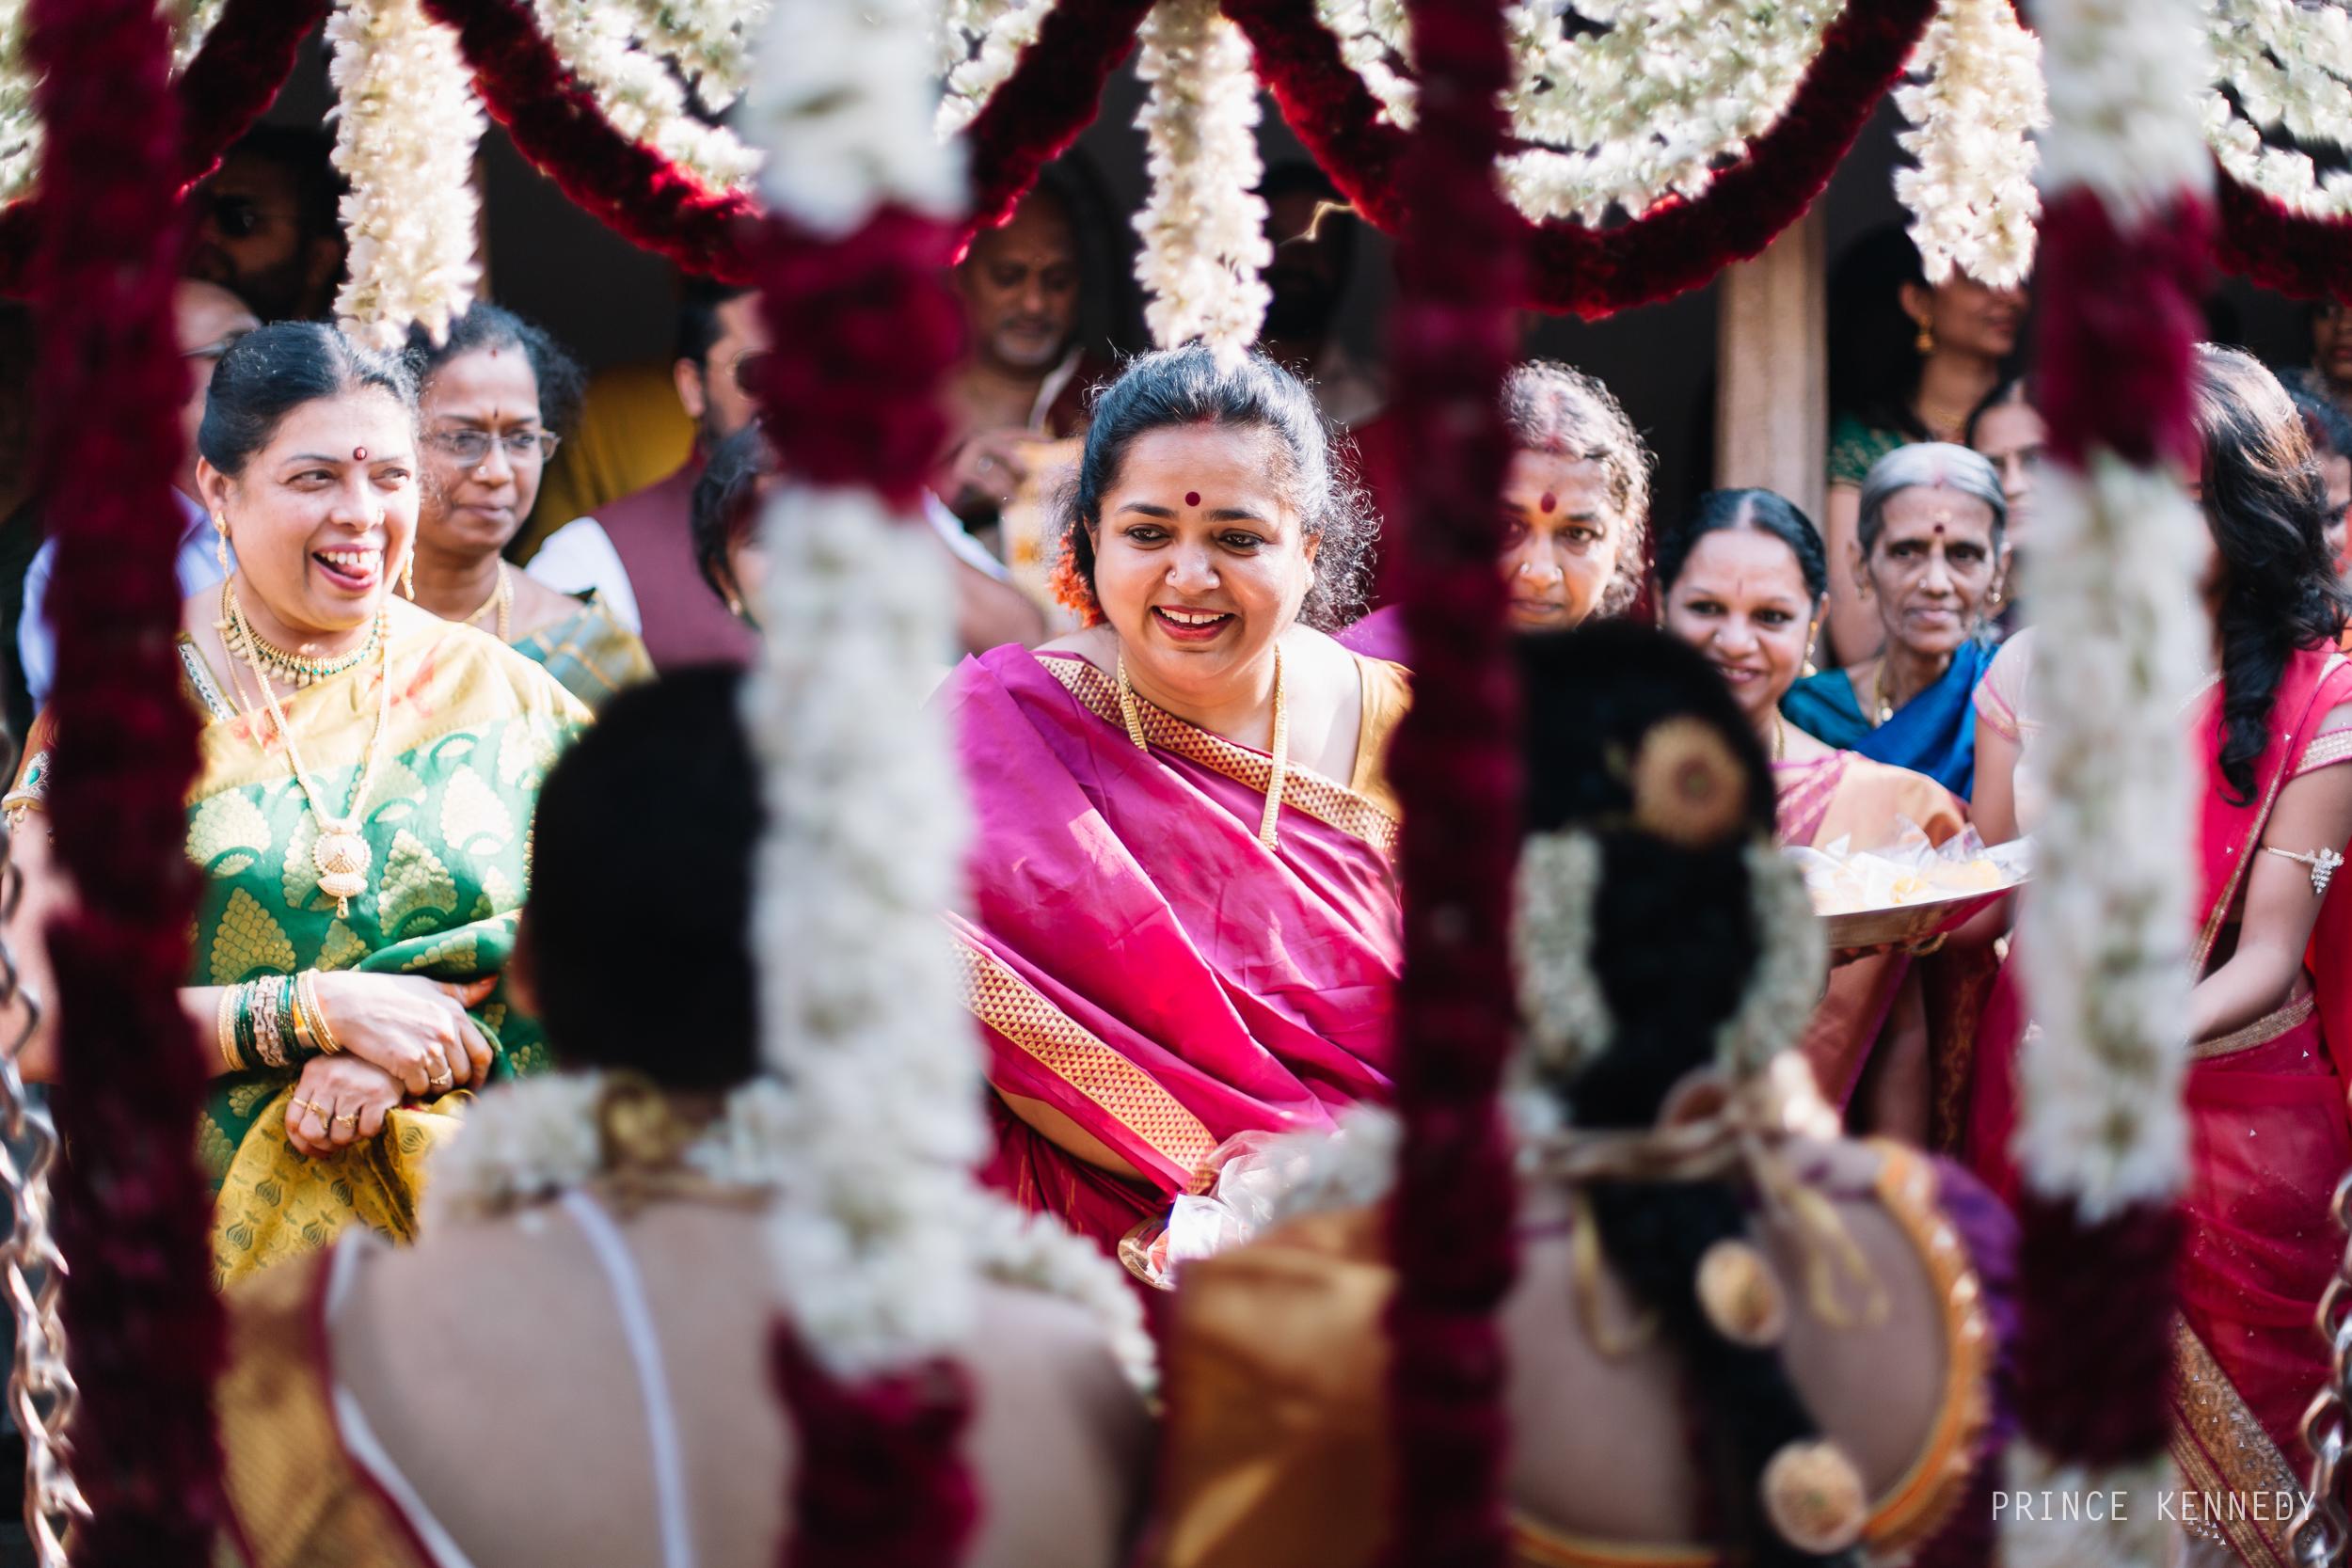 Athmajja-Nithesh-Engagement-Couple-Portrait-Portraiture-Wedding-Couple-Portrait-Chennai-Photographer-Candid-Photography-Destination-Best-Prince-Kennedy-Photography-169.jpg